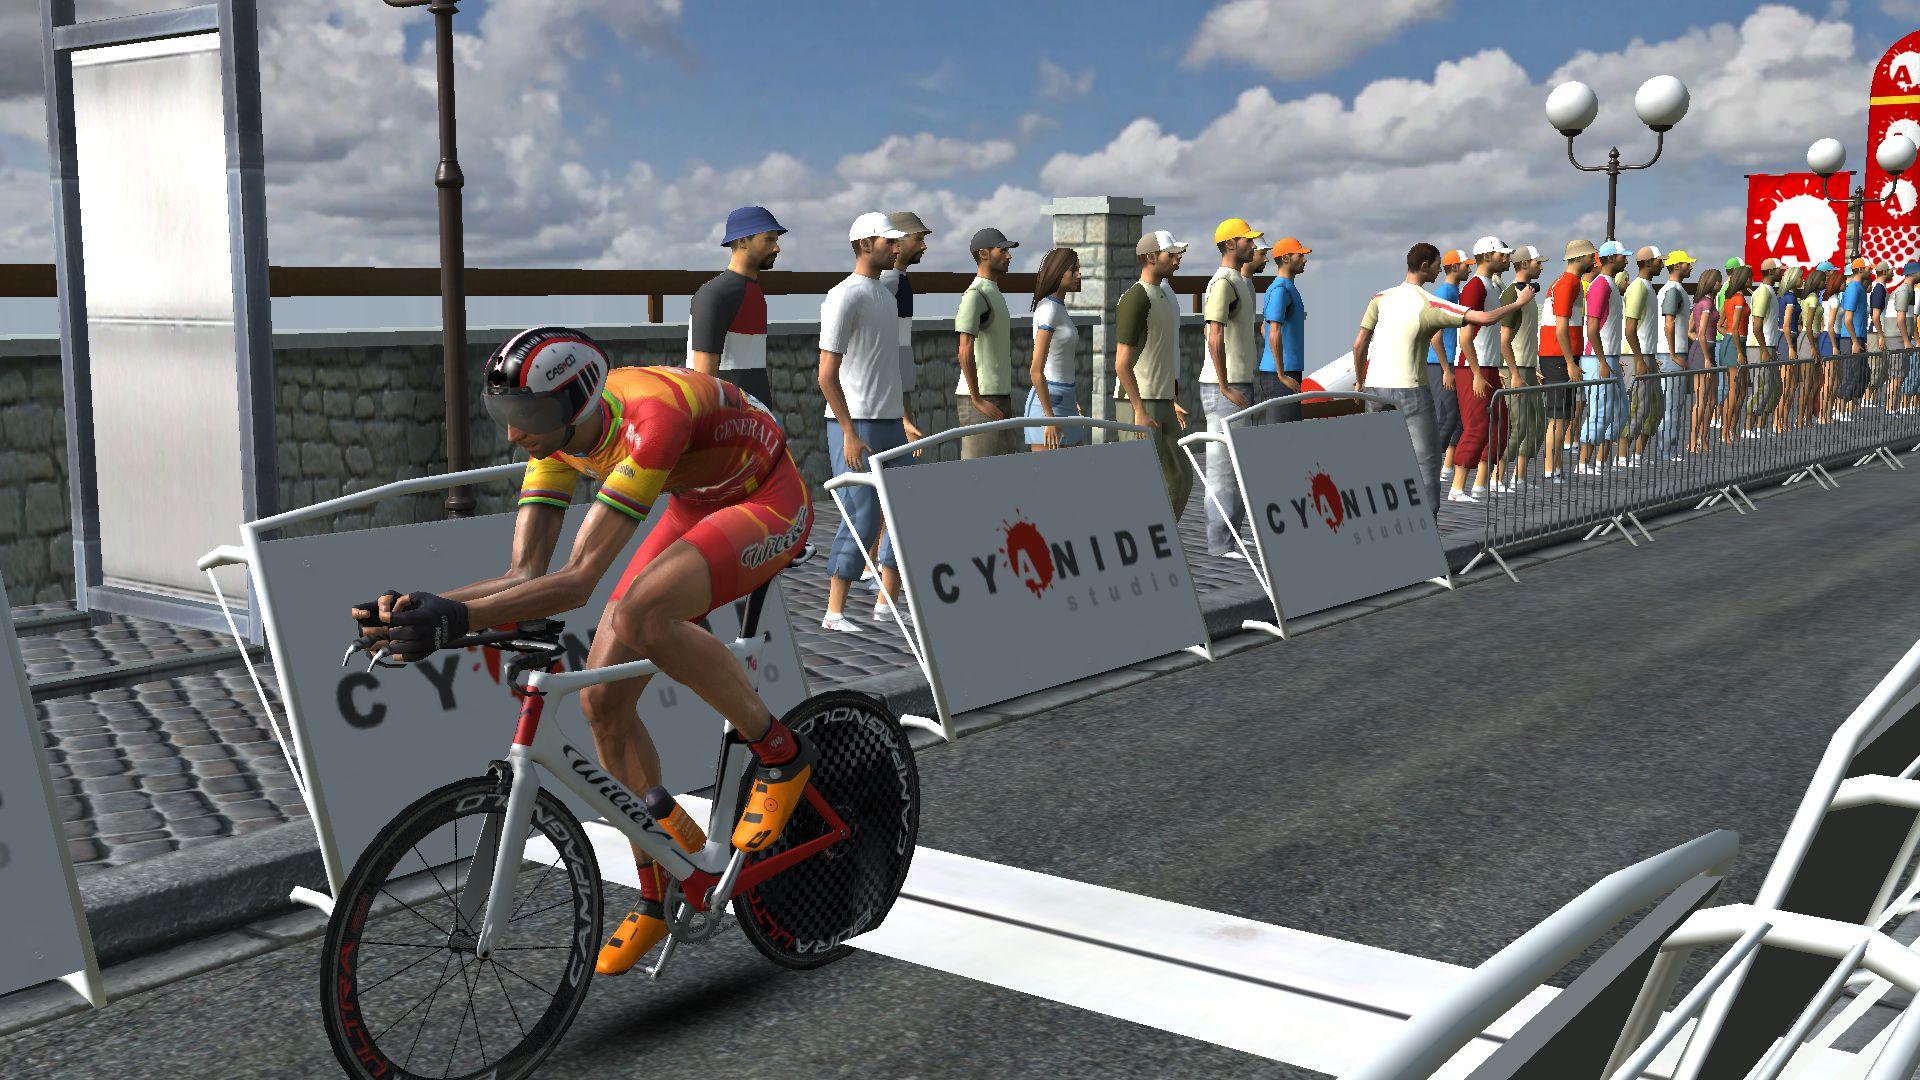 pcmdaily.com/images/mg/2019/Races/GTM/Giro/mg19_giro_09_PCM0066.jpg